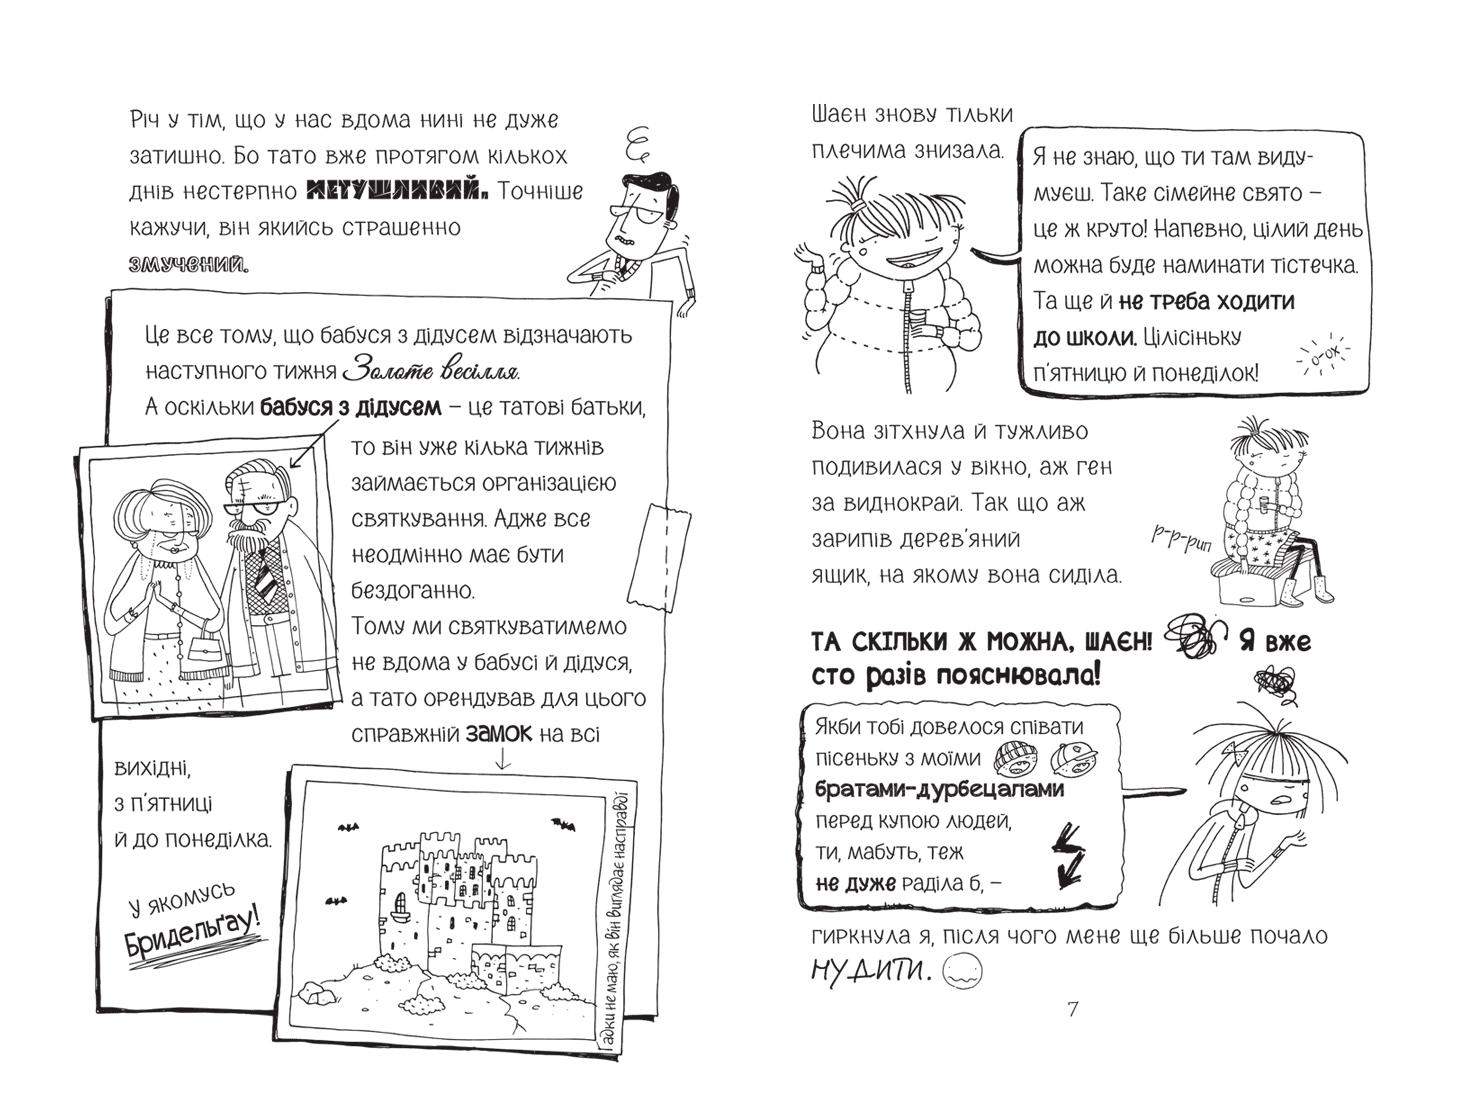 Фрагмент книги «Черевичок кенгуру» автора Аліс Пантермюллер